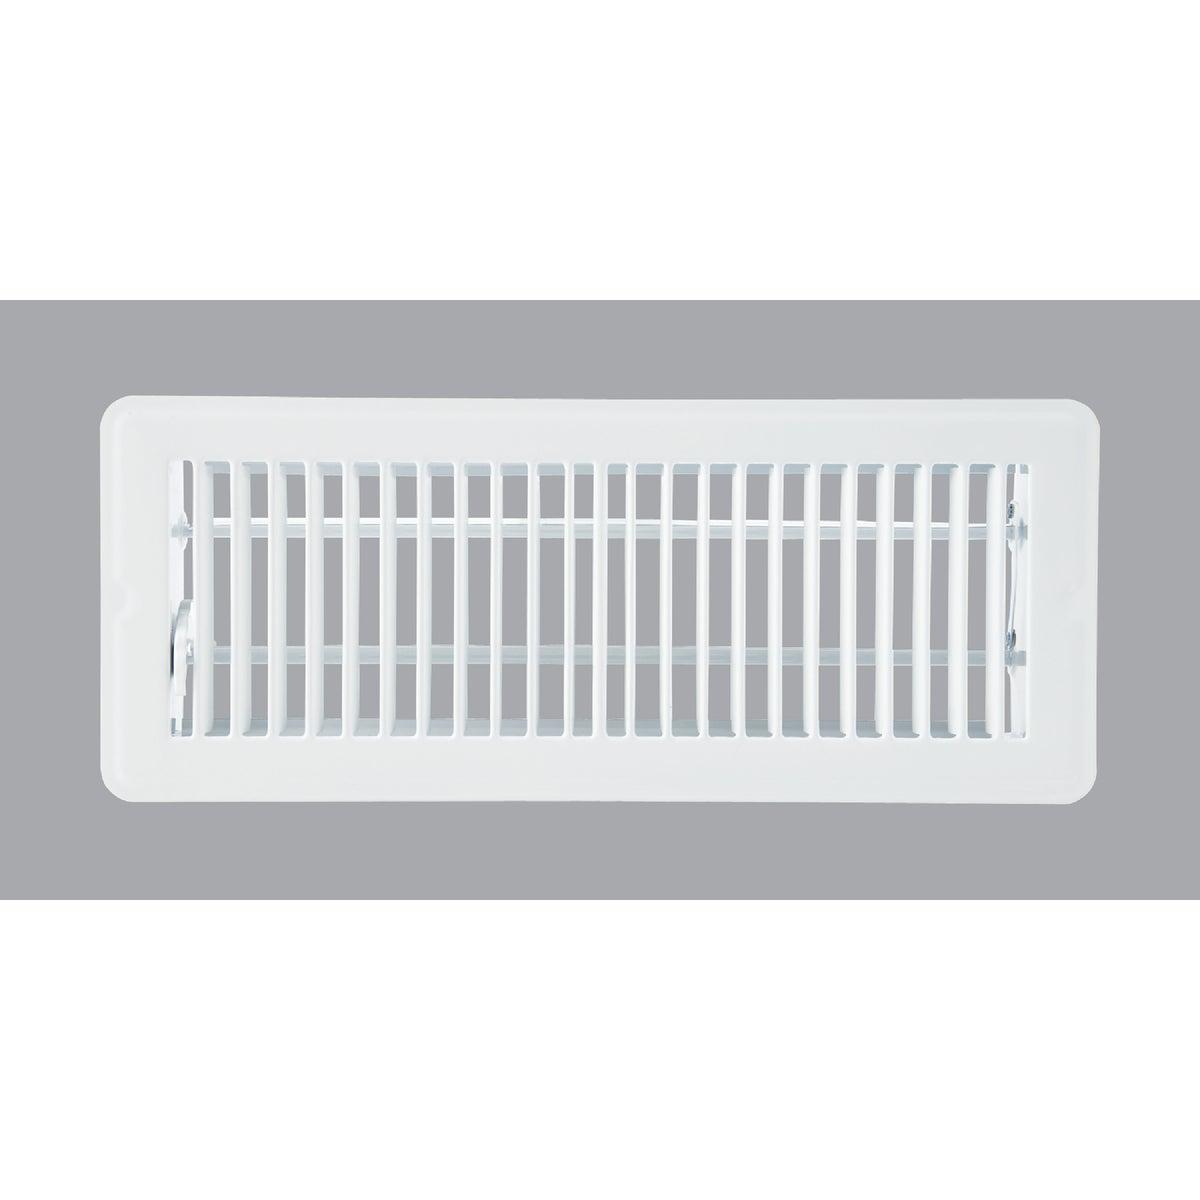 Home Impressions Steel Floor Register, 1FL0412WH-NH